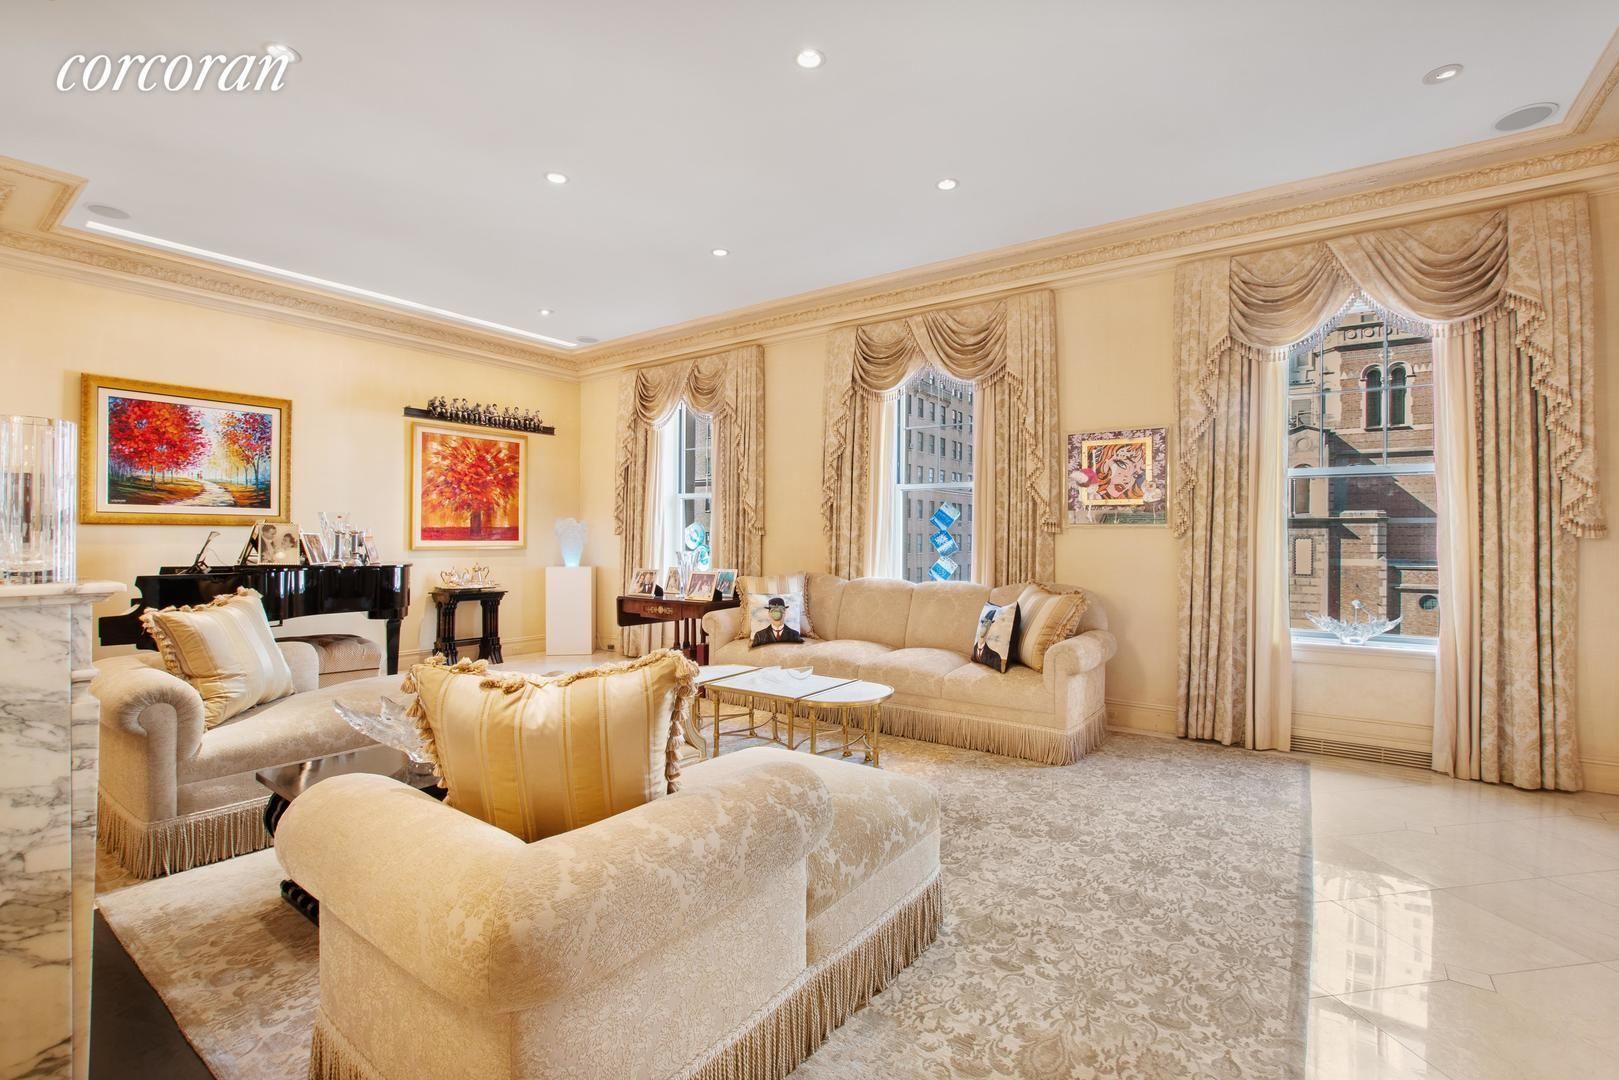 Apartment for sale at 521 Park Avenue, Apt 5BC